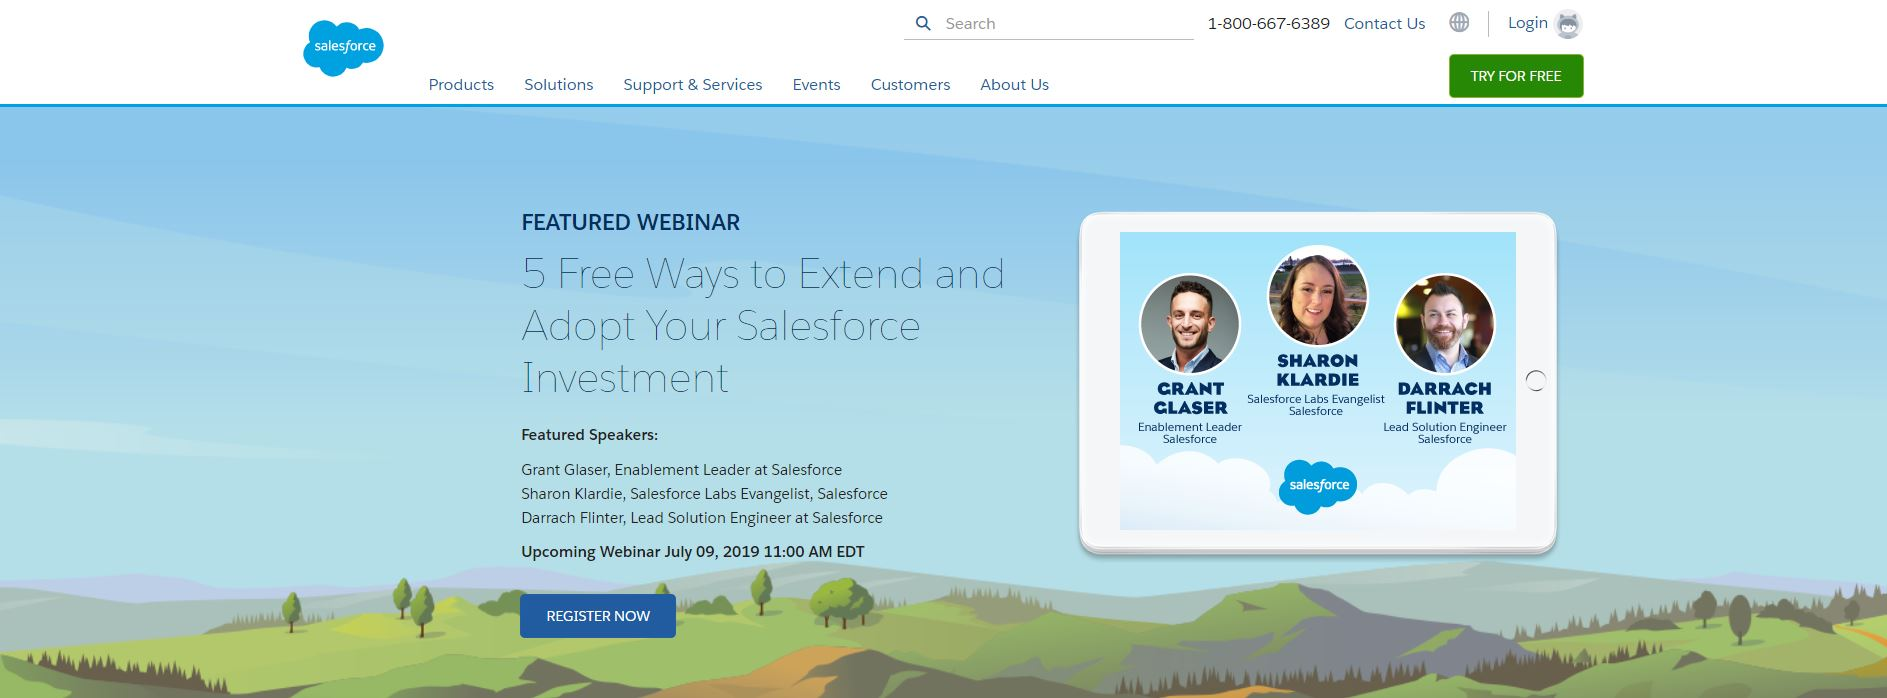 Salesforce webinar